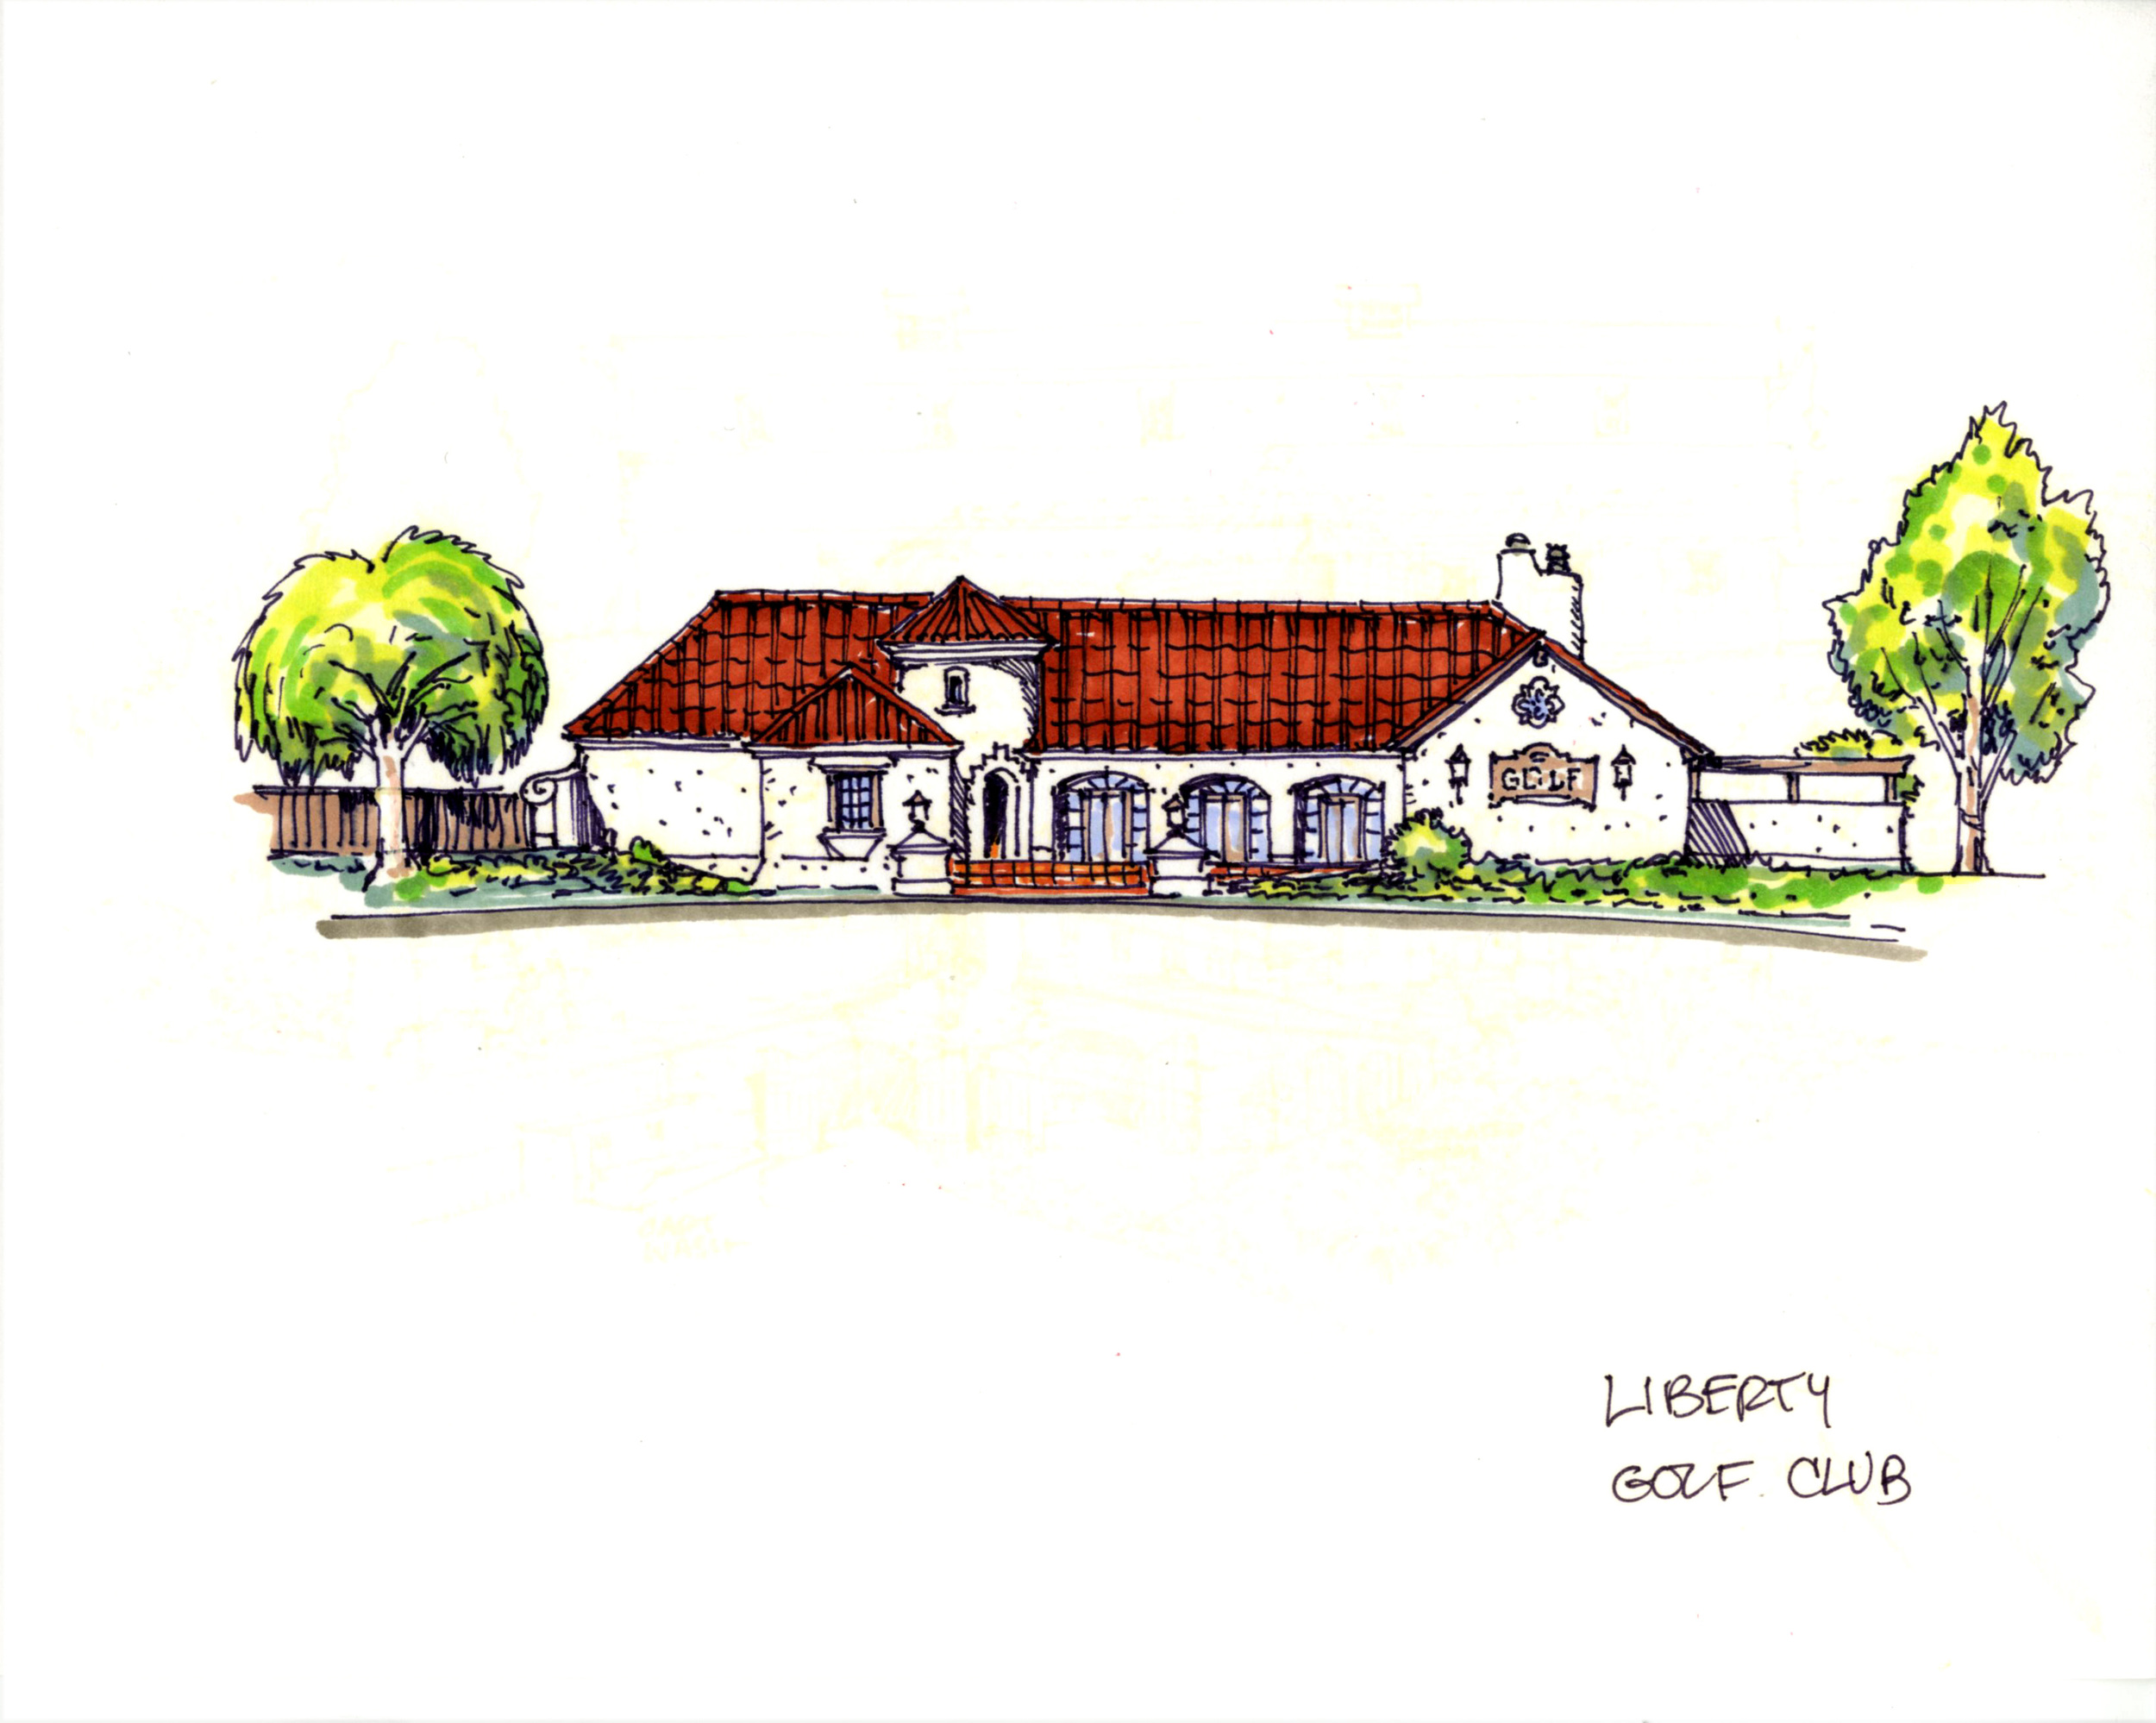 Liberty Golf Club201.jpg